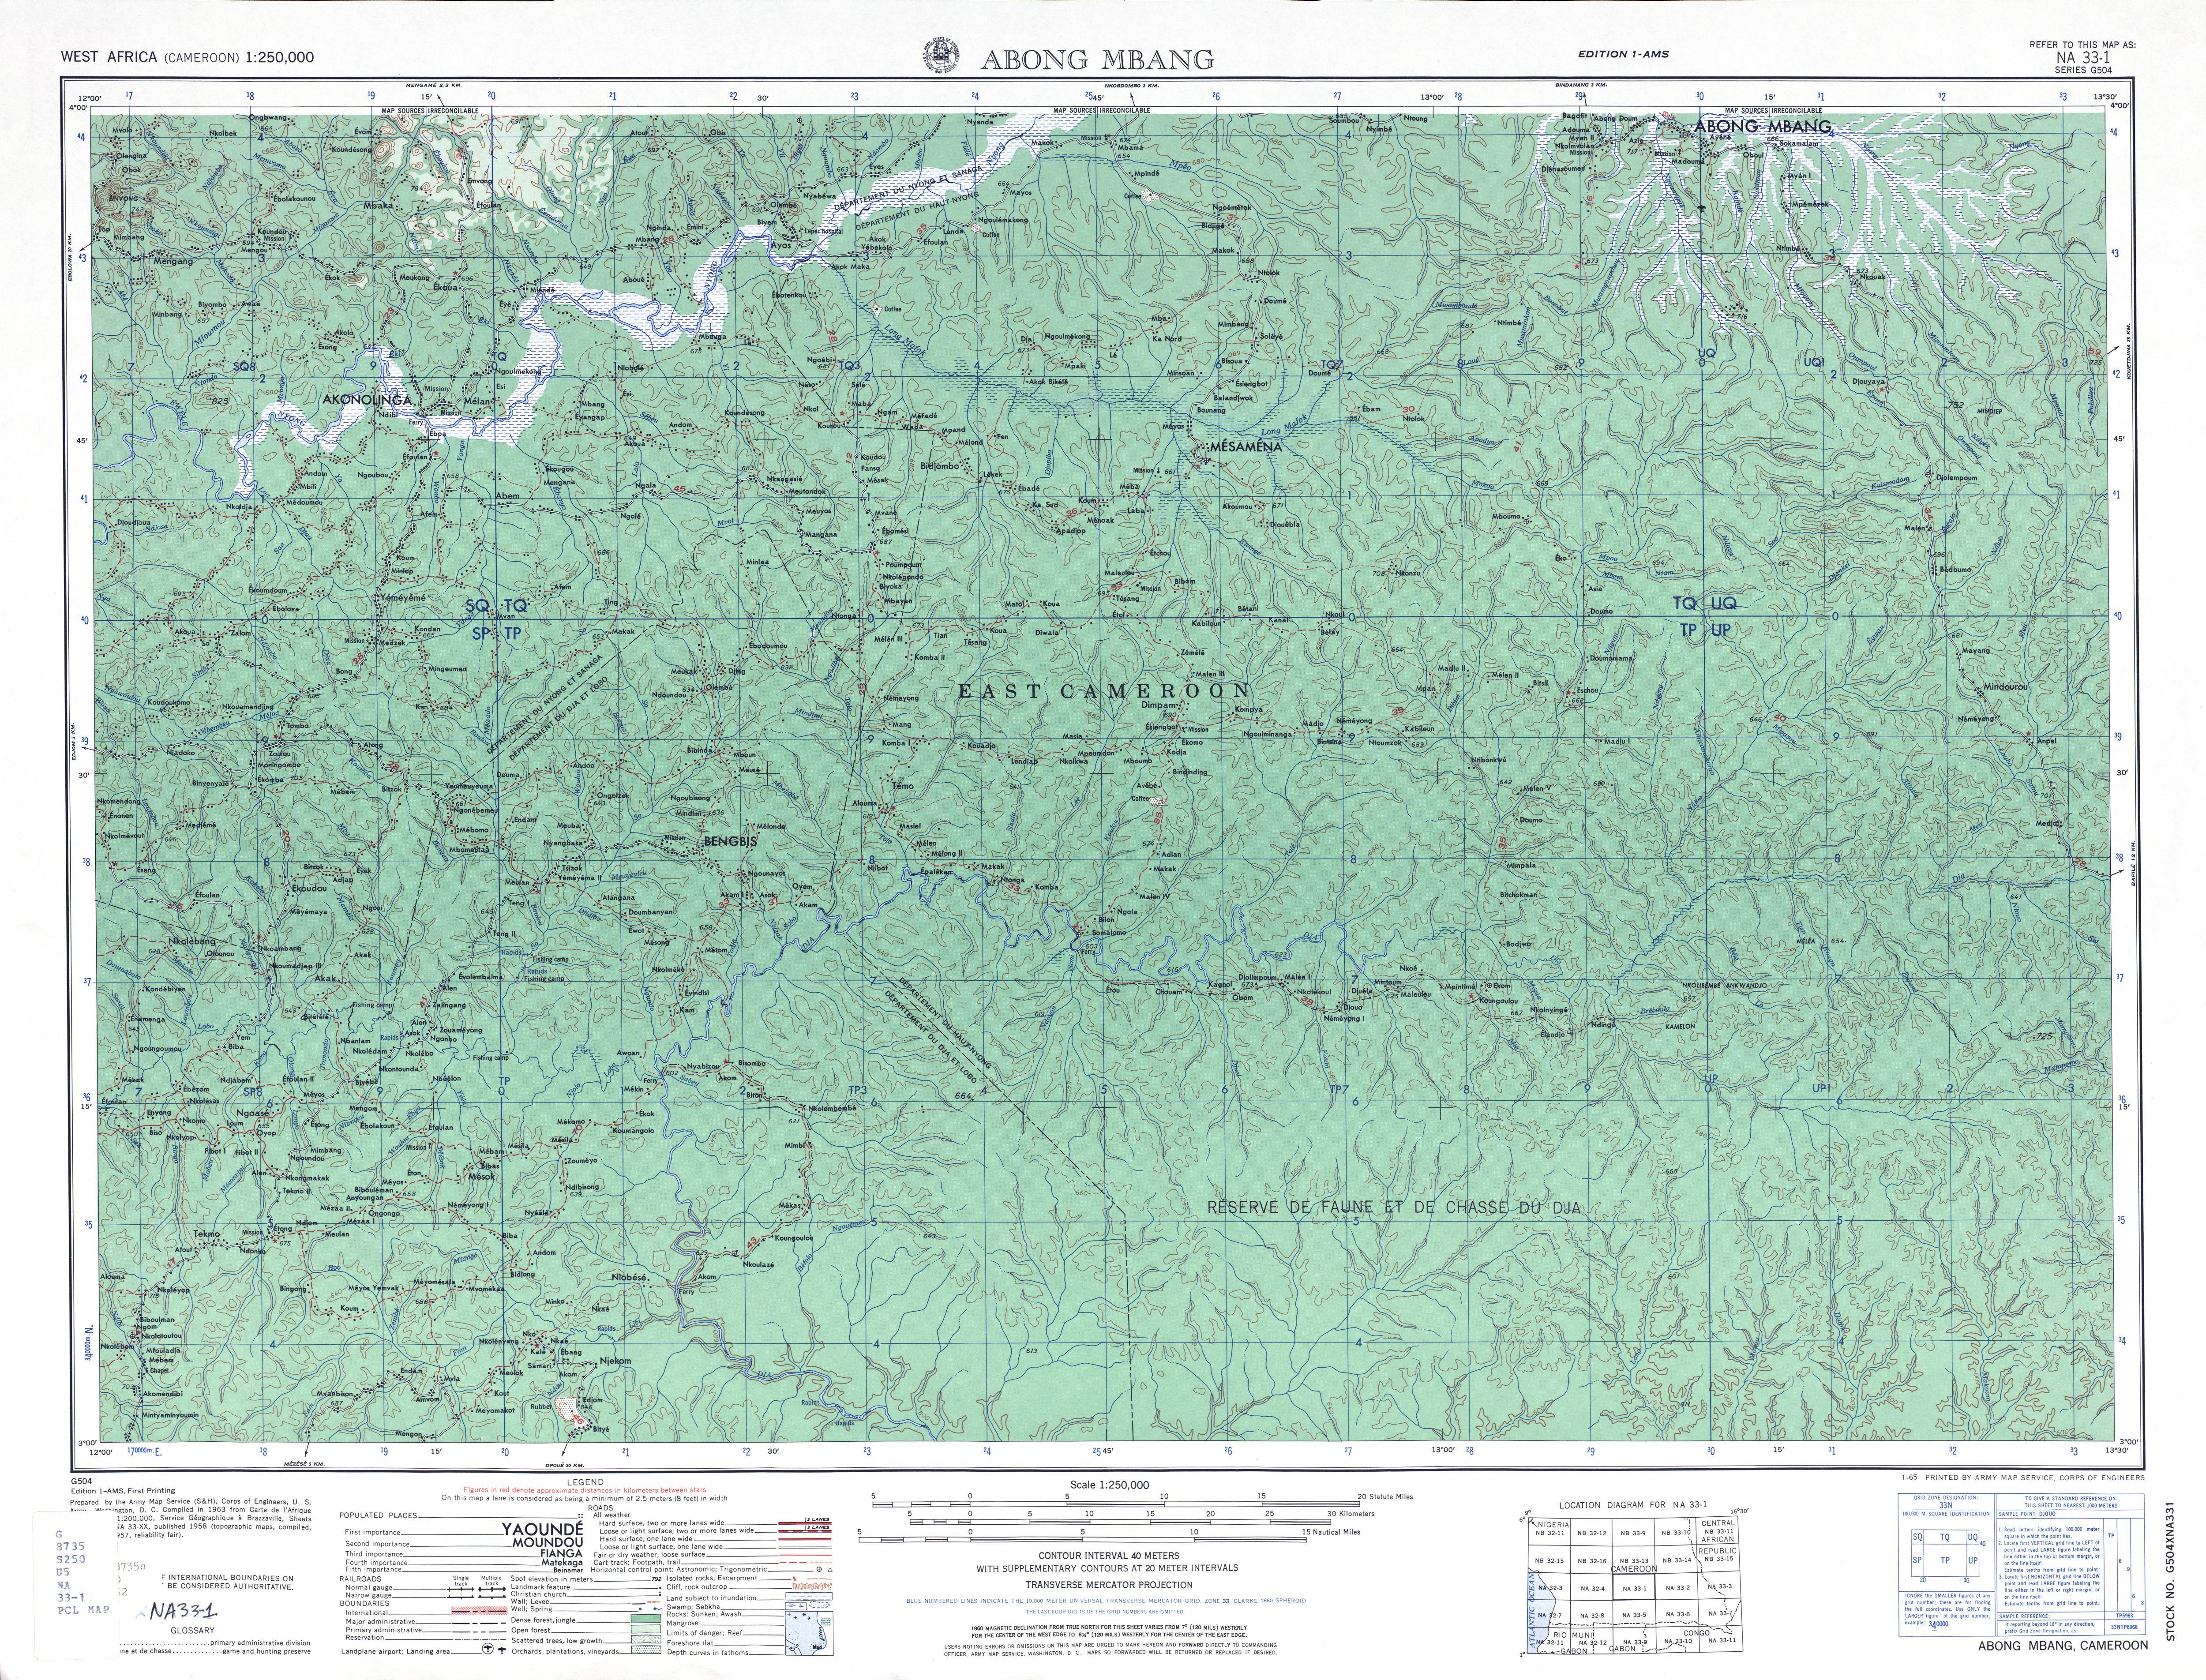 USArmymapsv - Us army maps kmz